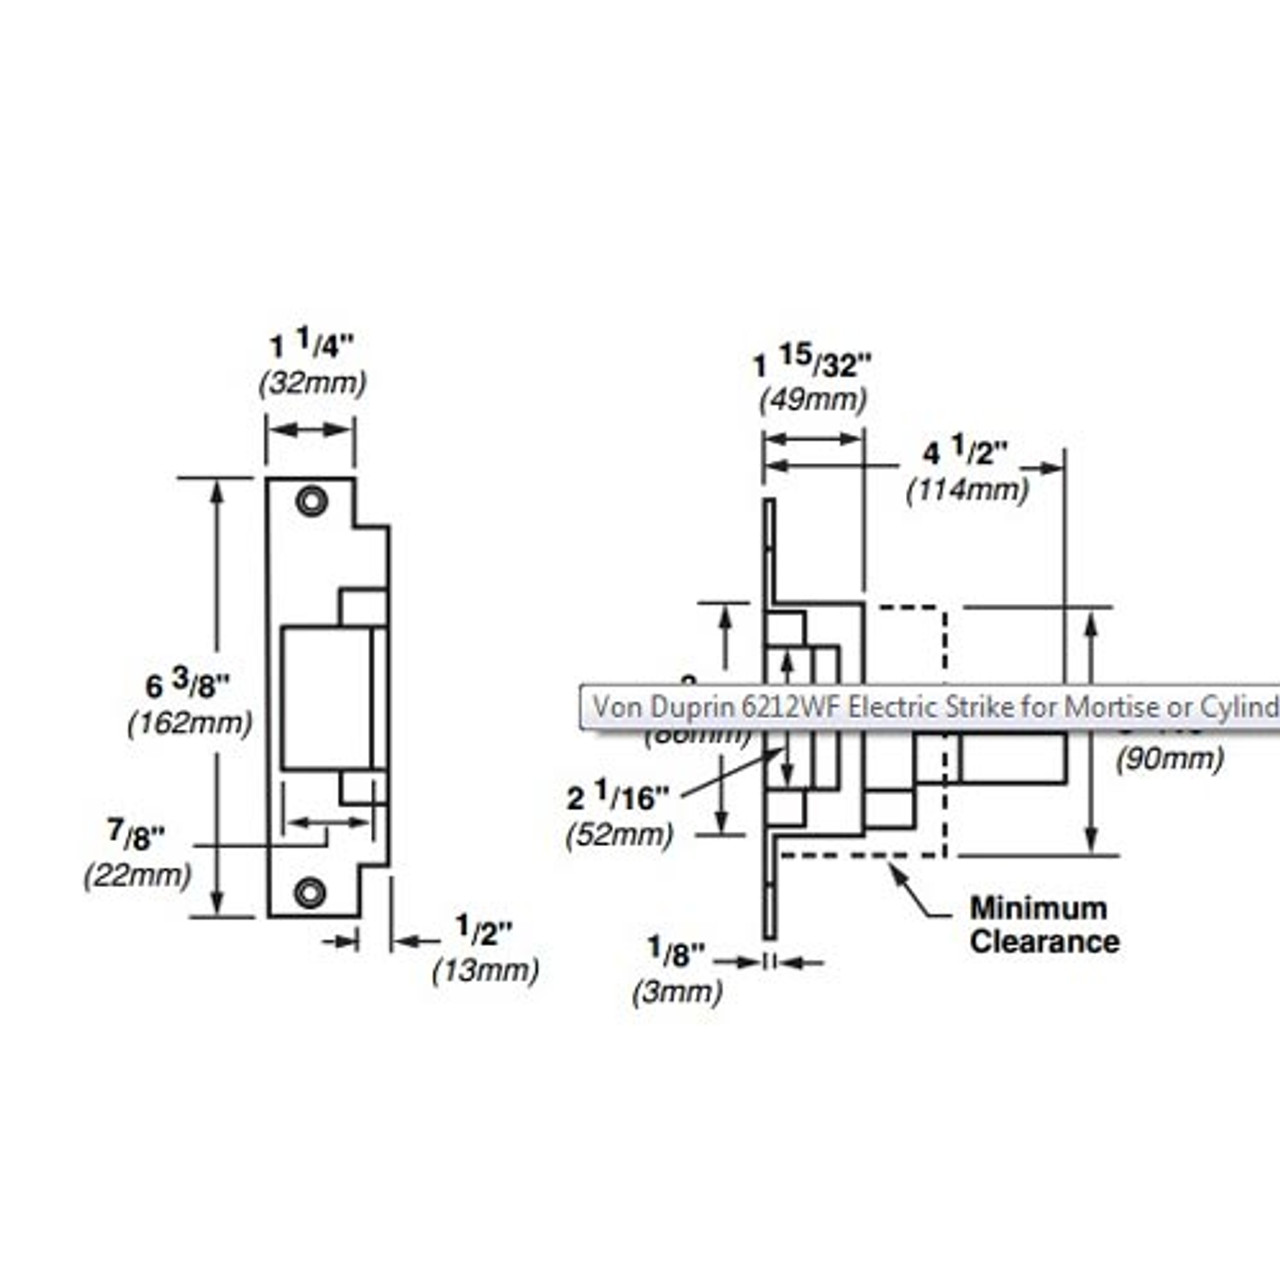 6212WF-FS-DS-LC-12VDC-US10B Von Duprin Electric Strike for Mortise or Cylindrical Locksets in Dark Bronze Finish